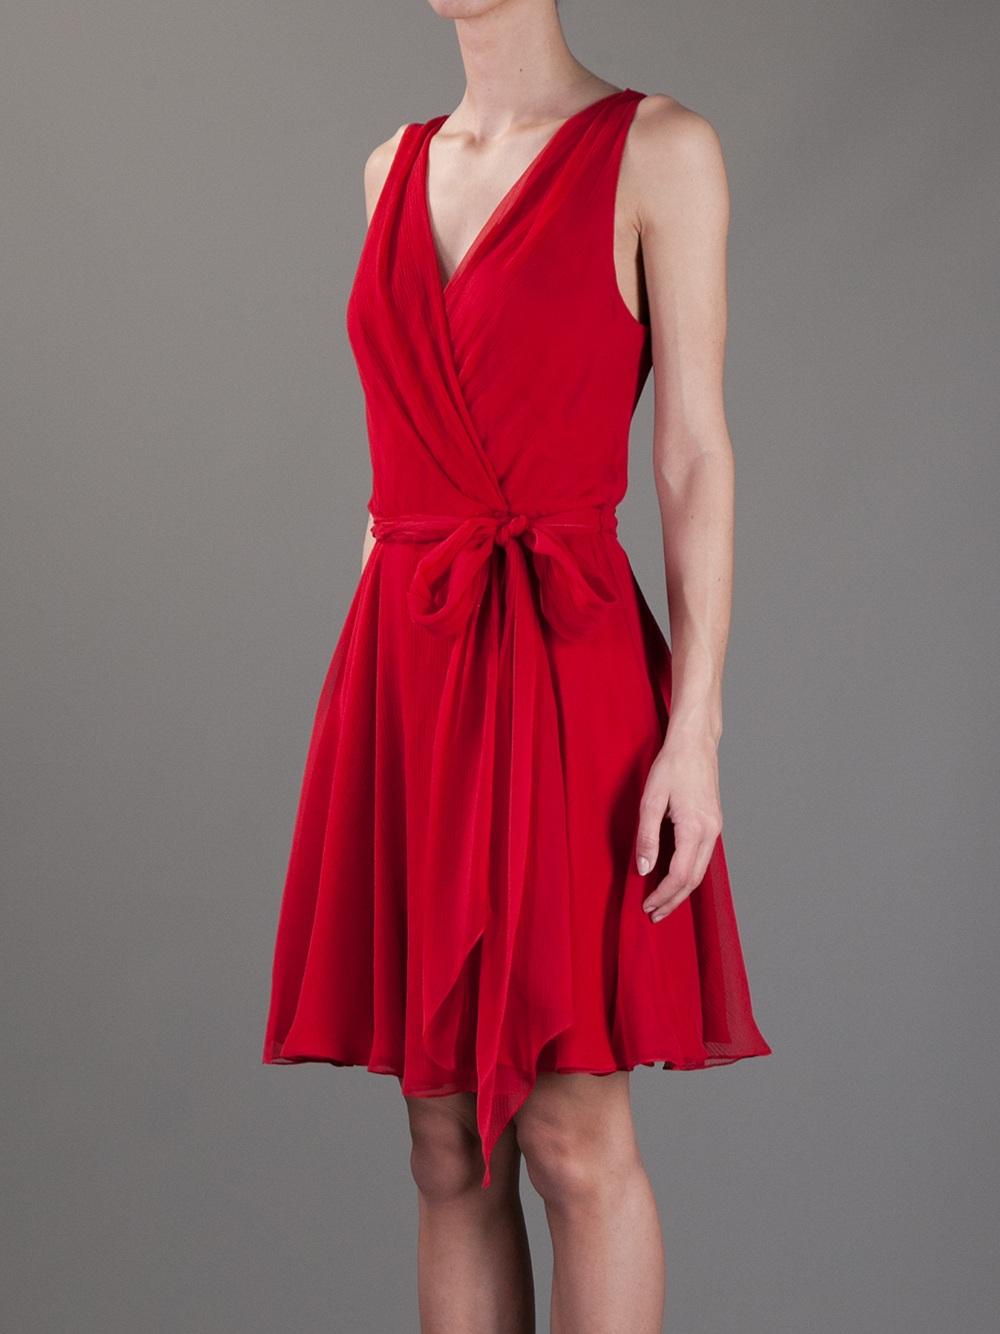 Sleeveless Wrap Dresses